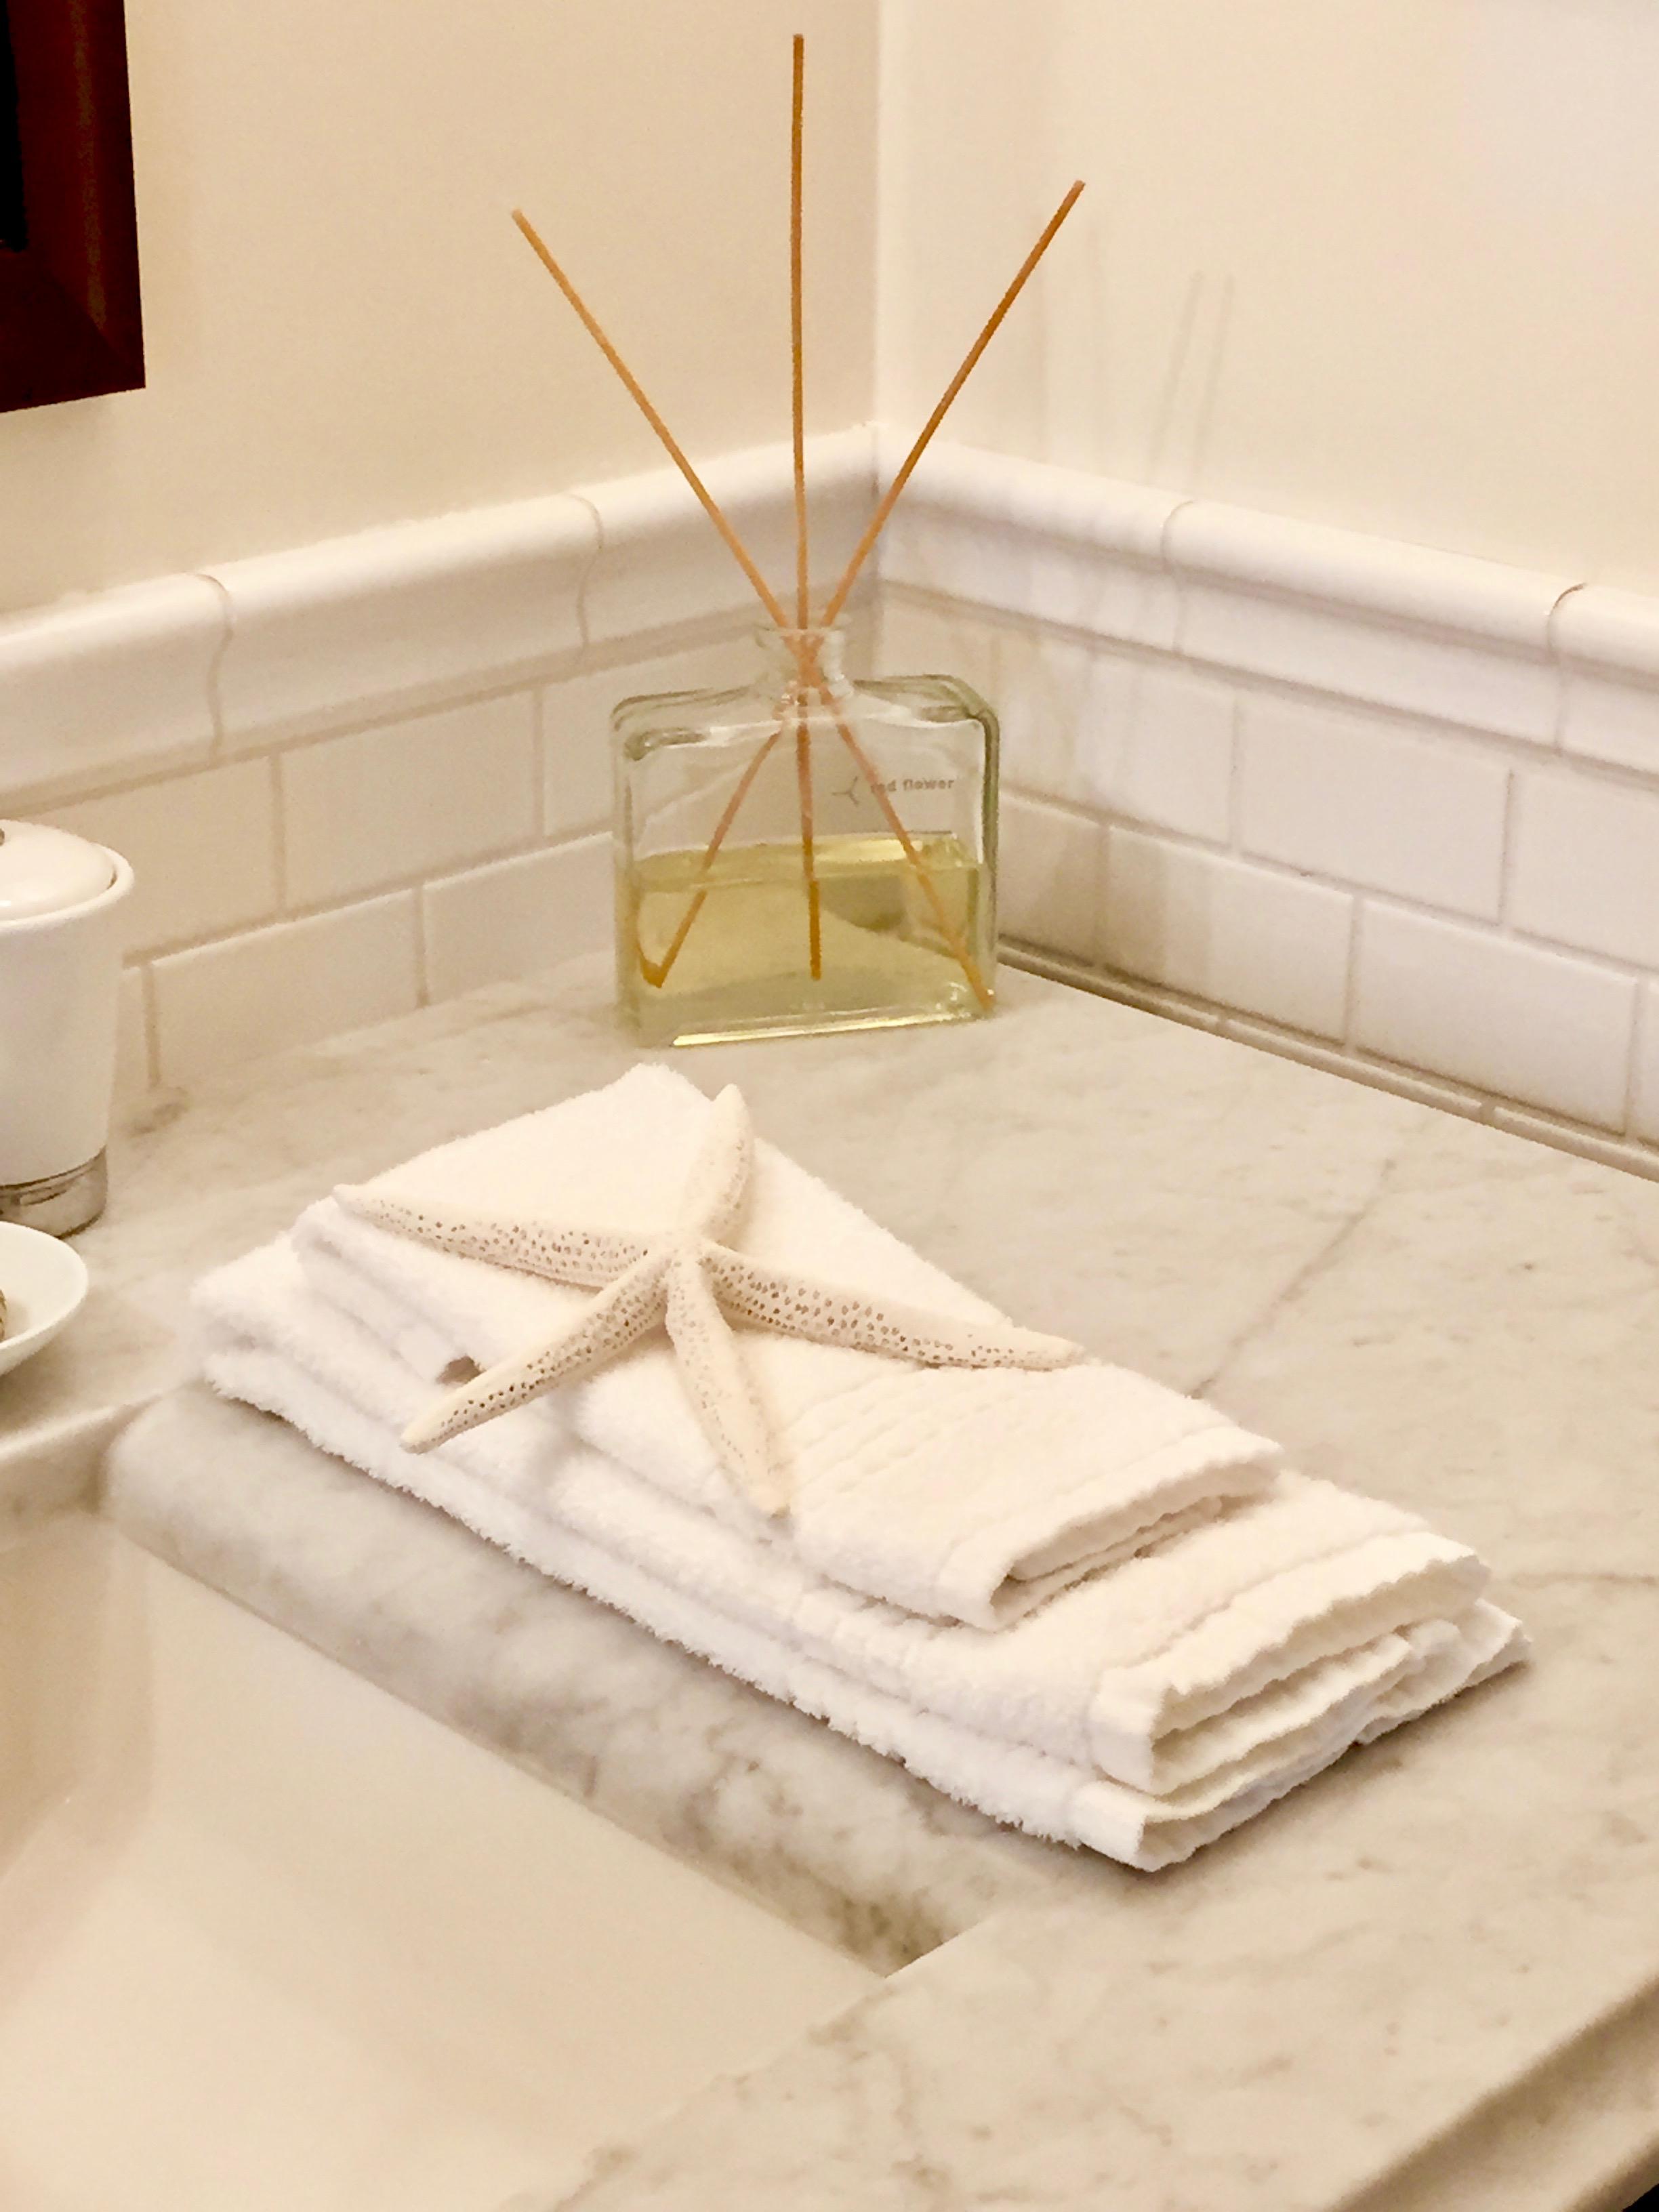 fragrance sticks in luxury bathroom